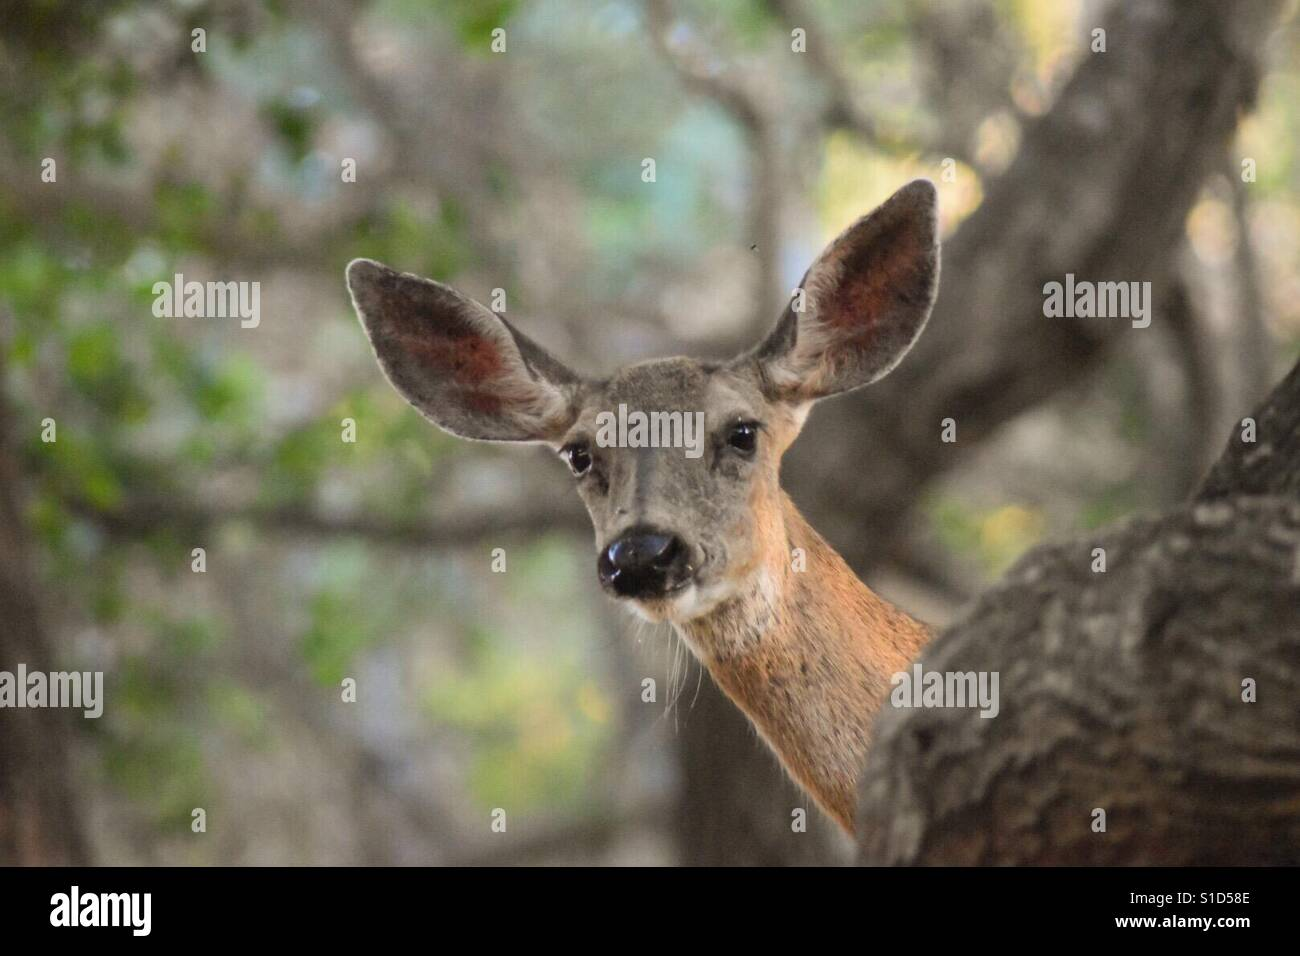 Oh Deer! - Stock Image